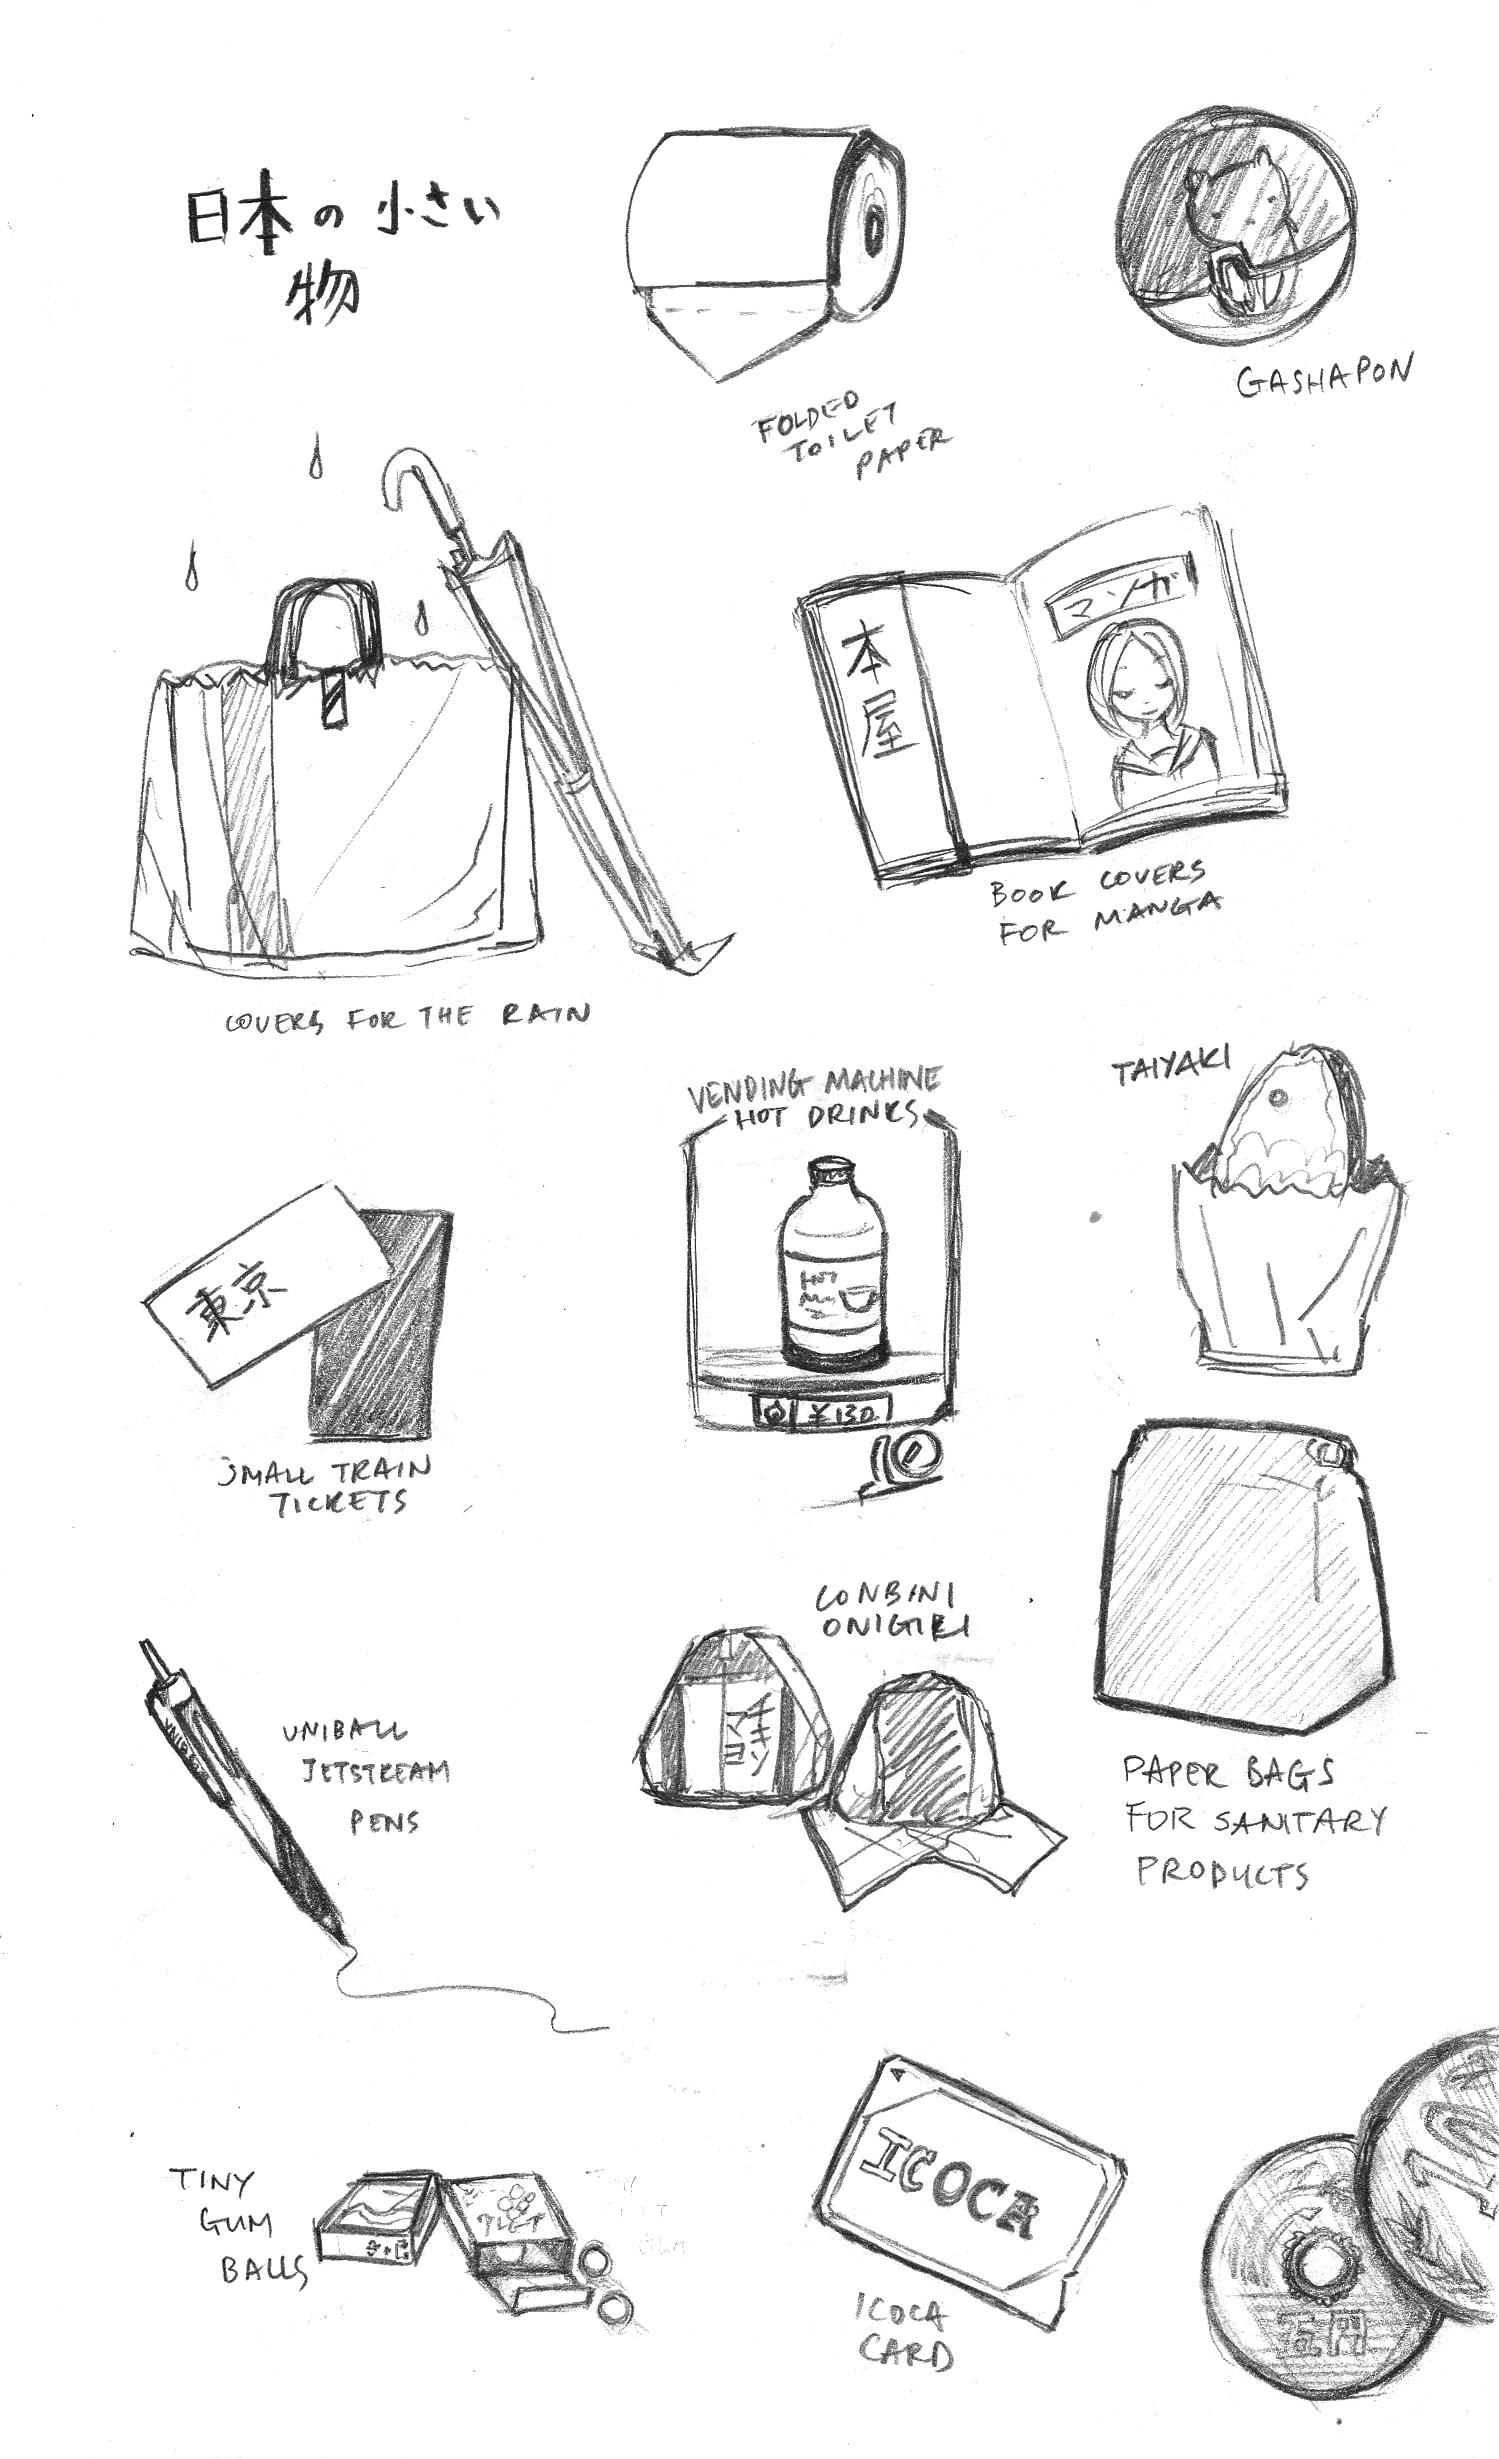 japan, tokyo, small things, art, illustration, tickets, manga cover, taiyaki, onigiri, pens, sketch and run